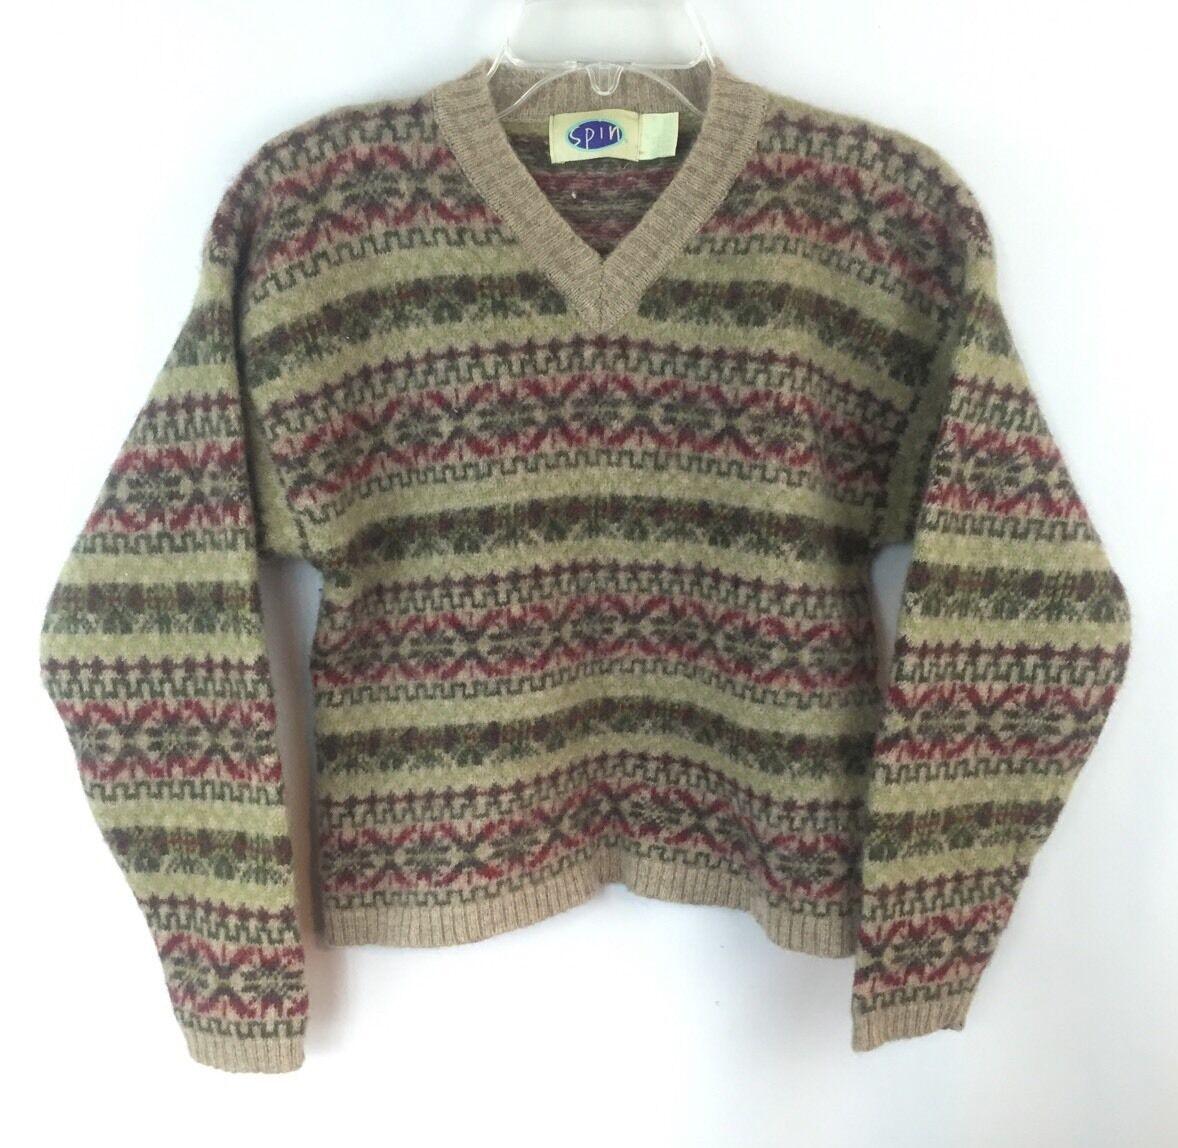 SPIN Vintage Shetland Wool Snowflake Sweater Sz M Medium Green Cranberry